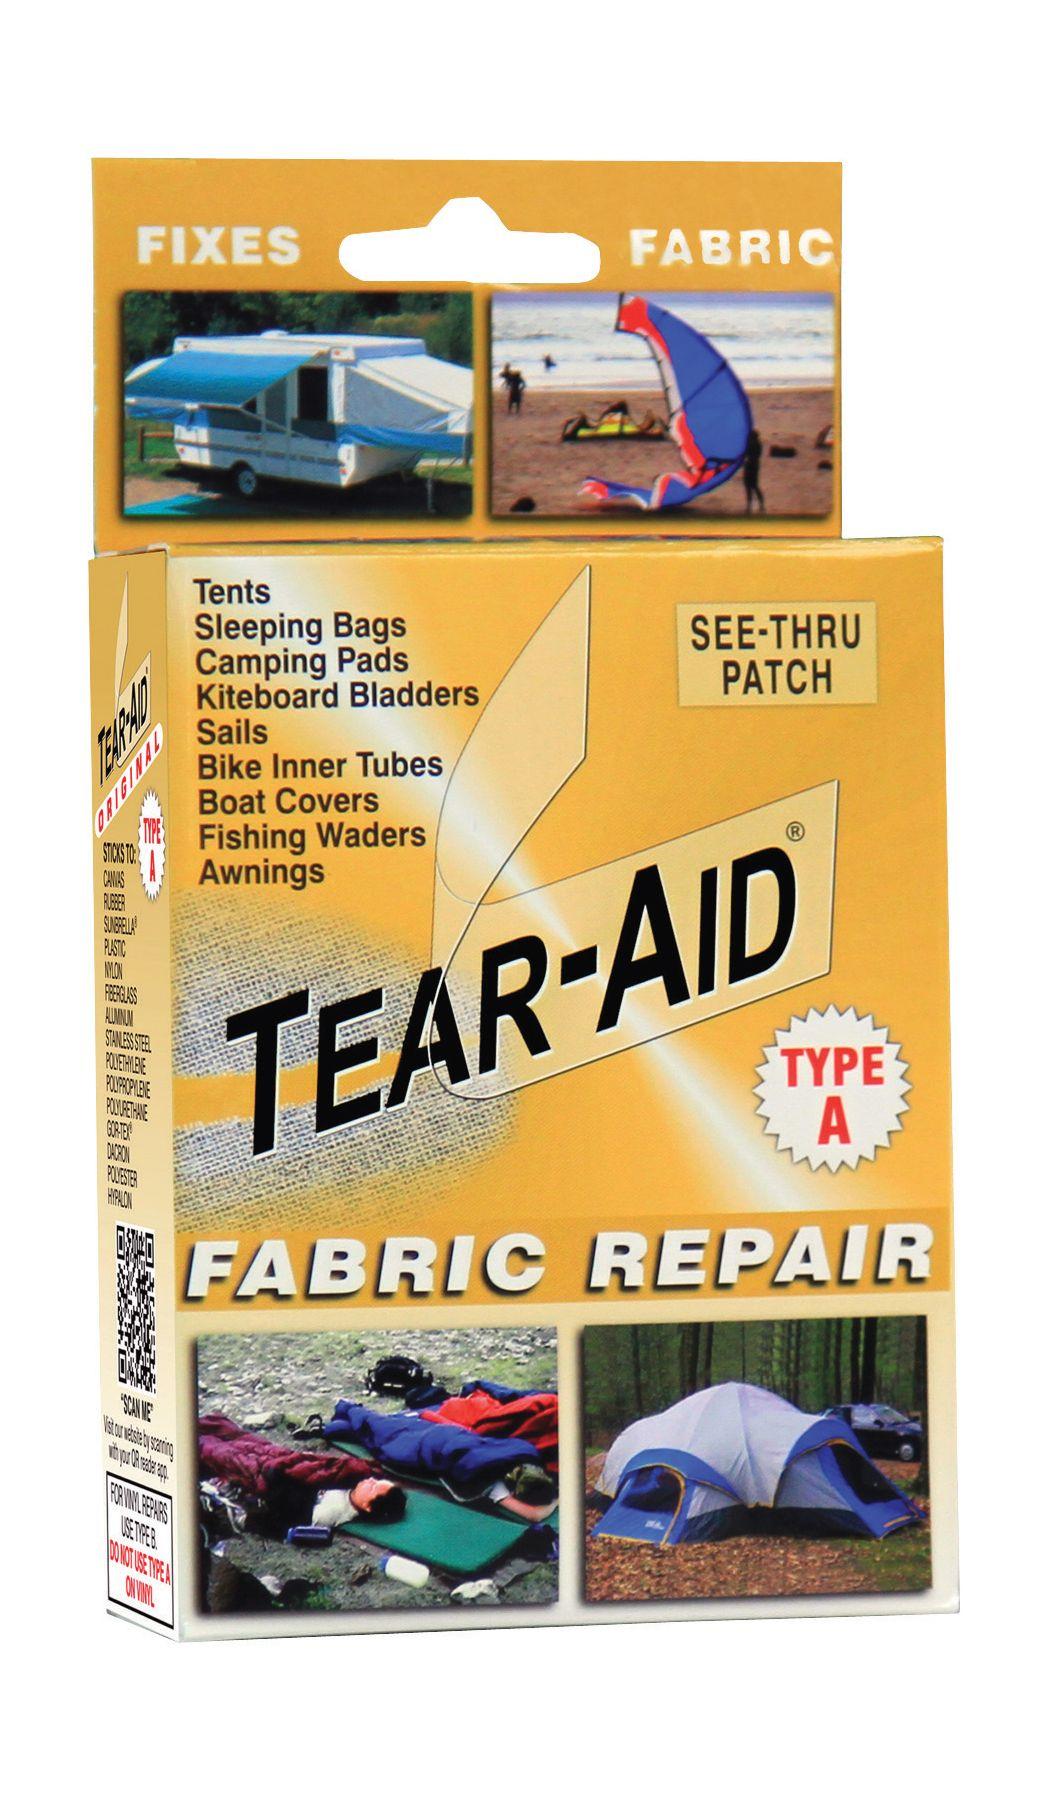 sc 1 st  DICKu0027S Sporting Goods & Tear-Aid Fabric Repair Patch | DICKu0027S Sporting Goods